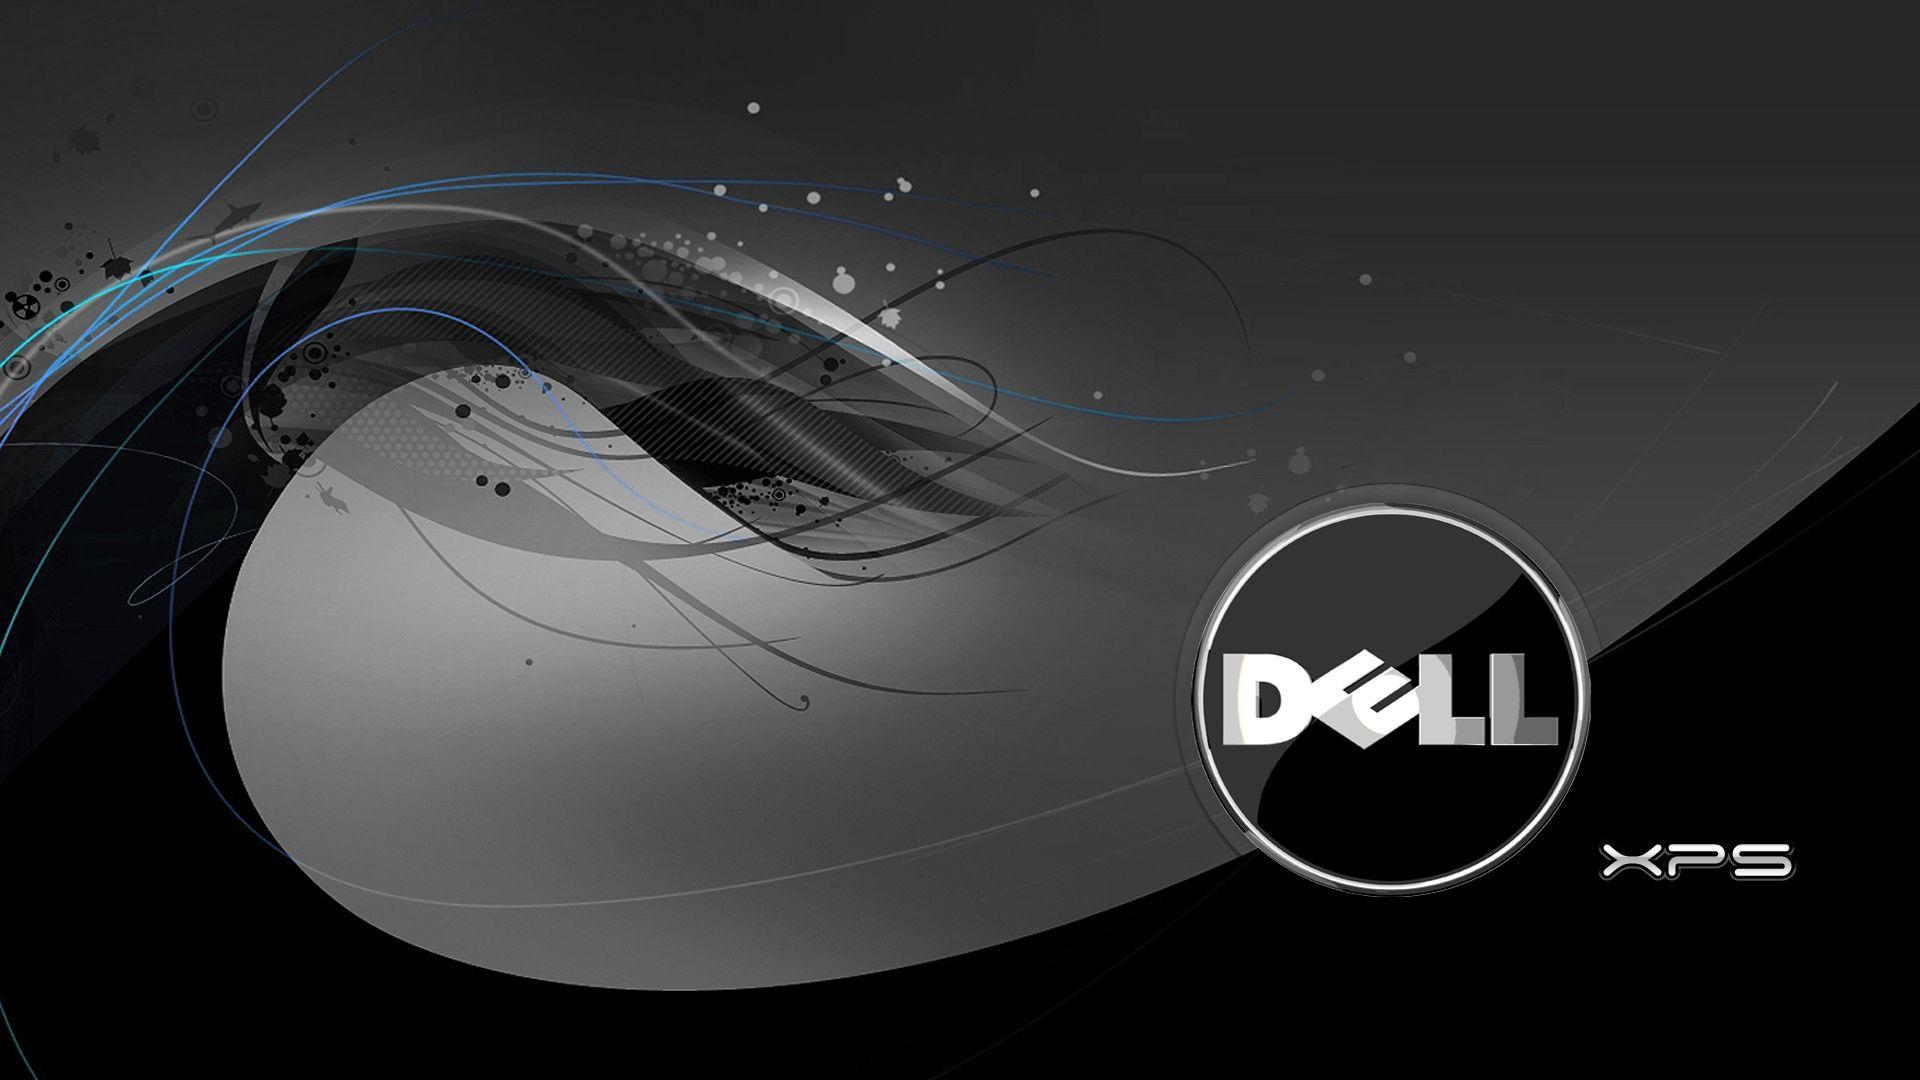 Best Dell Wallpaper Designs